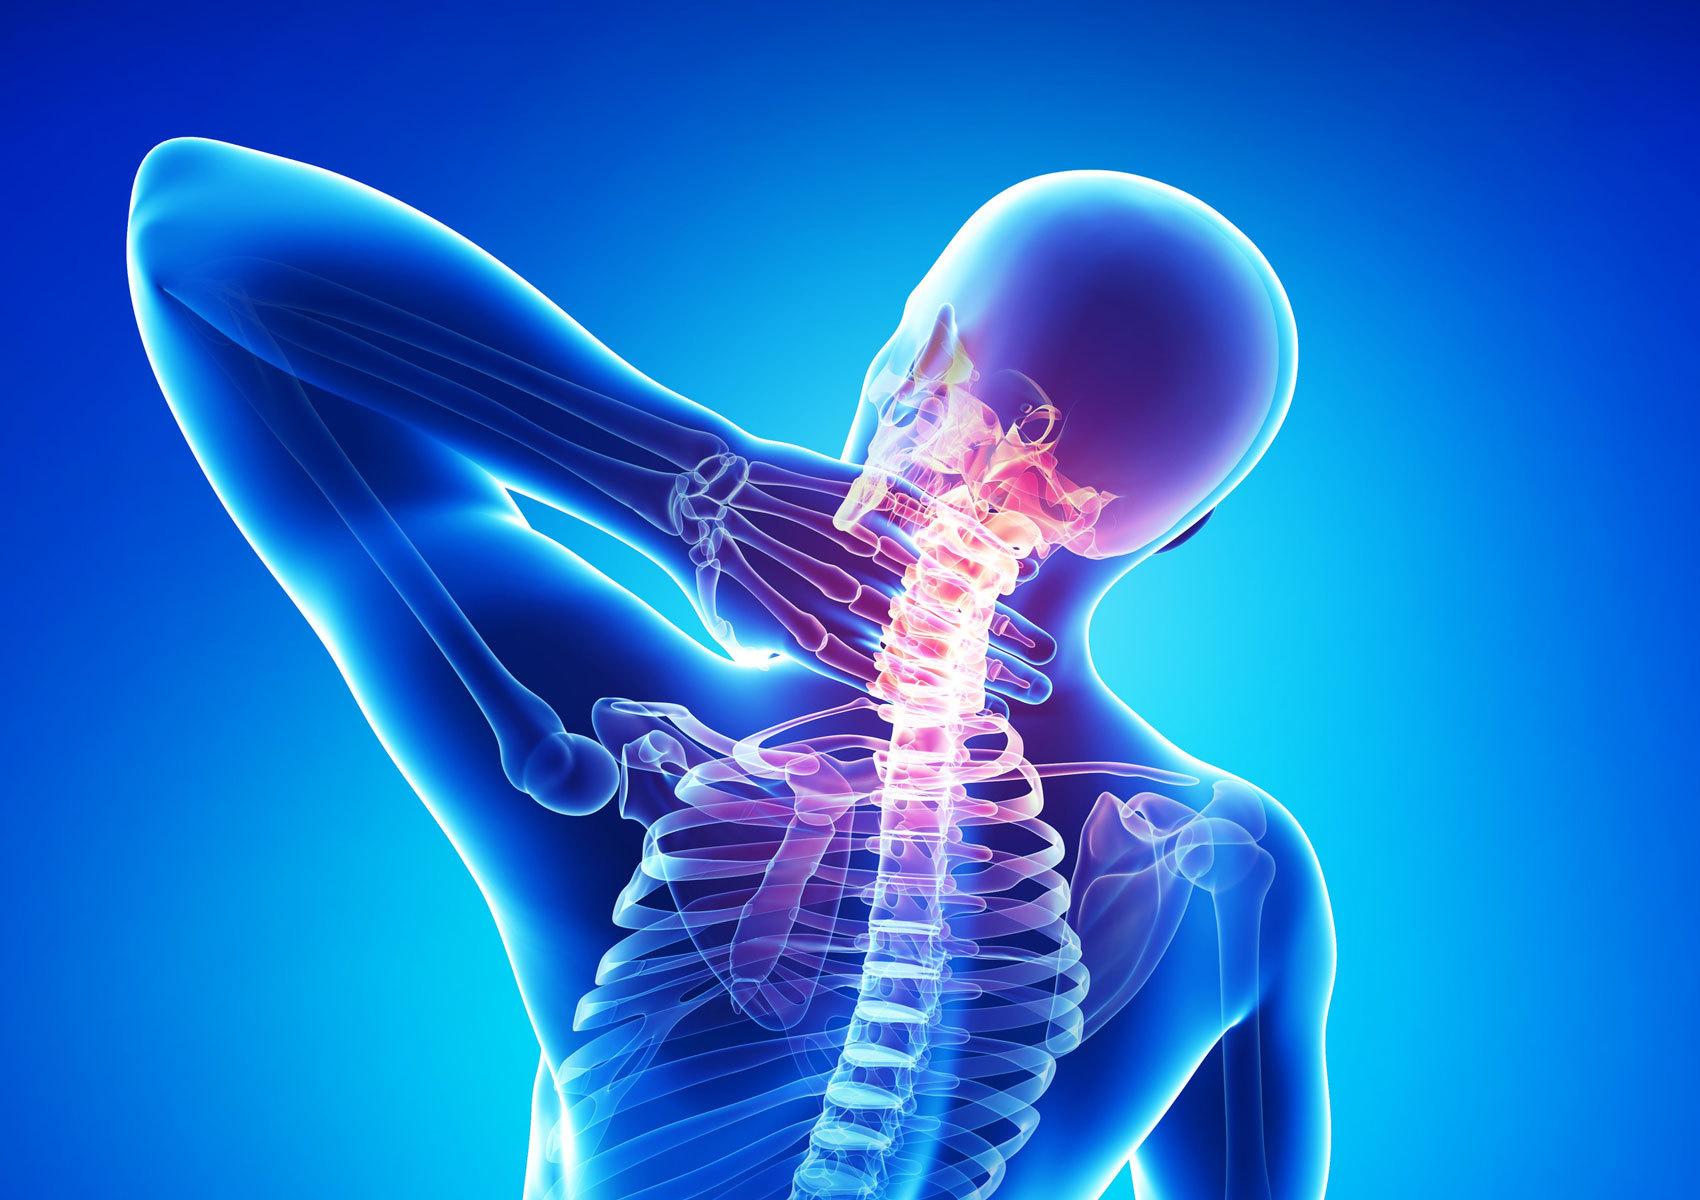 Остеопороз: методы оценки  риска  развития переломов